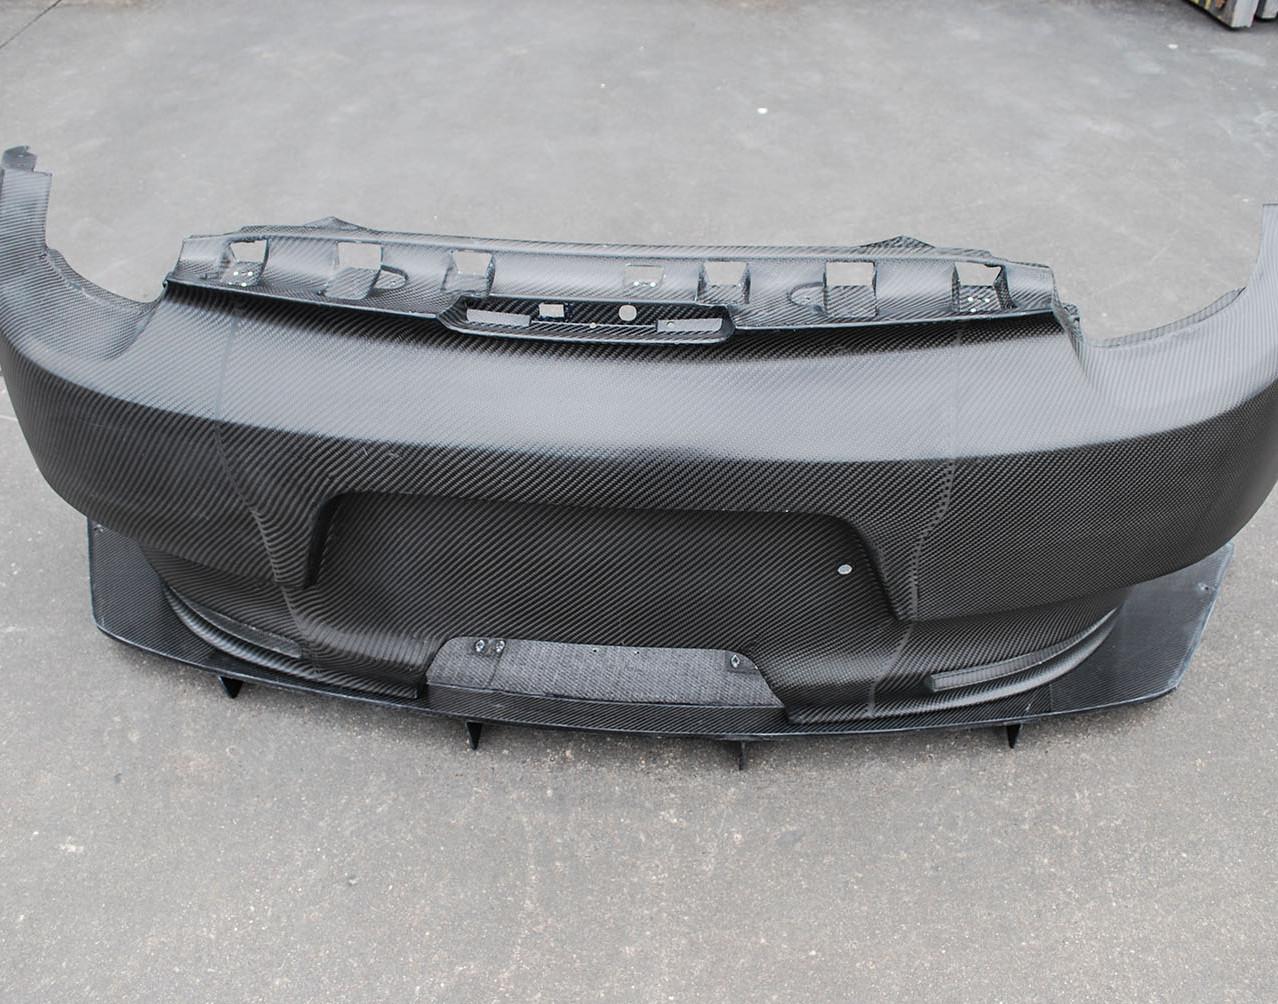 Cayman RSR Rear Bumper_Diffuser